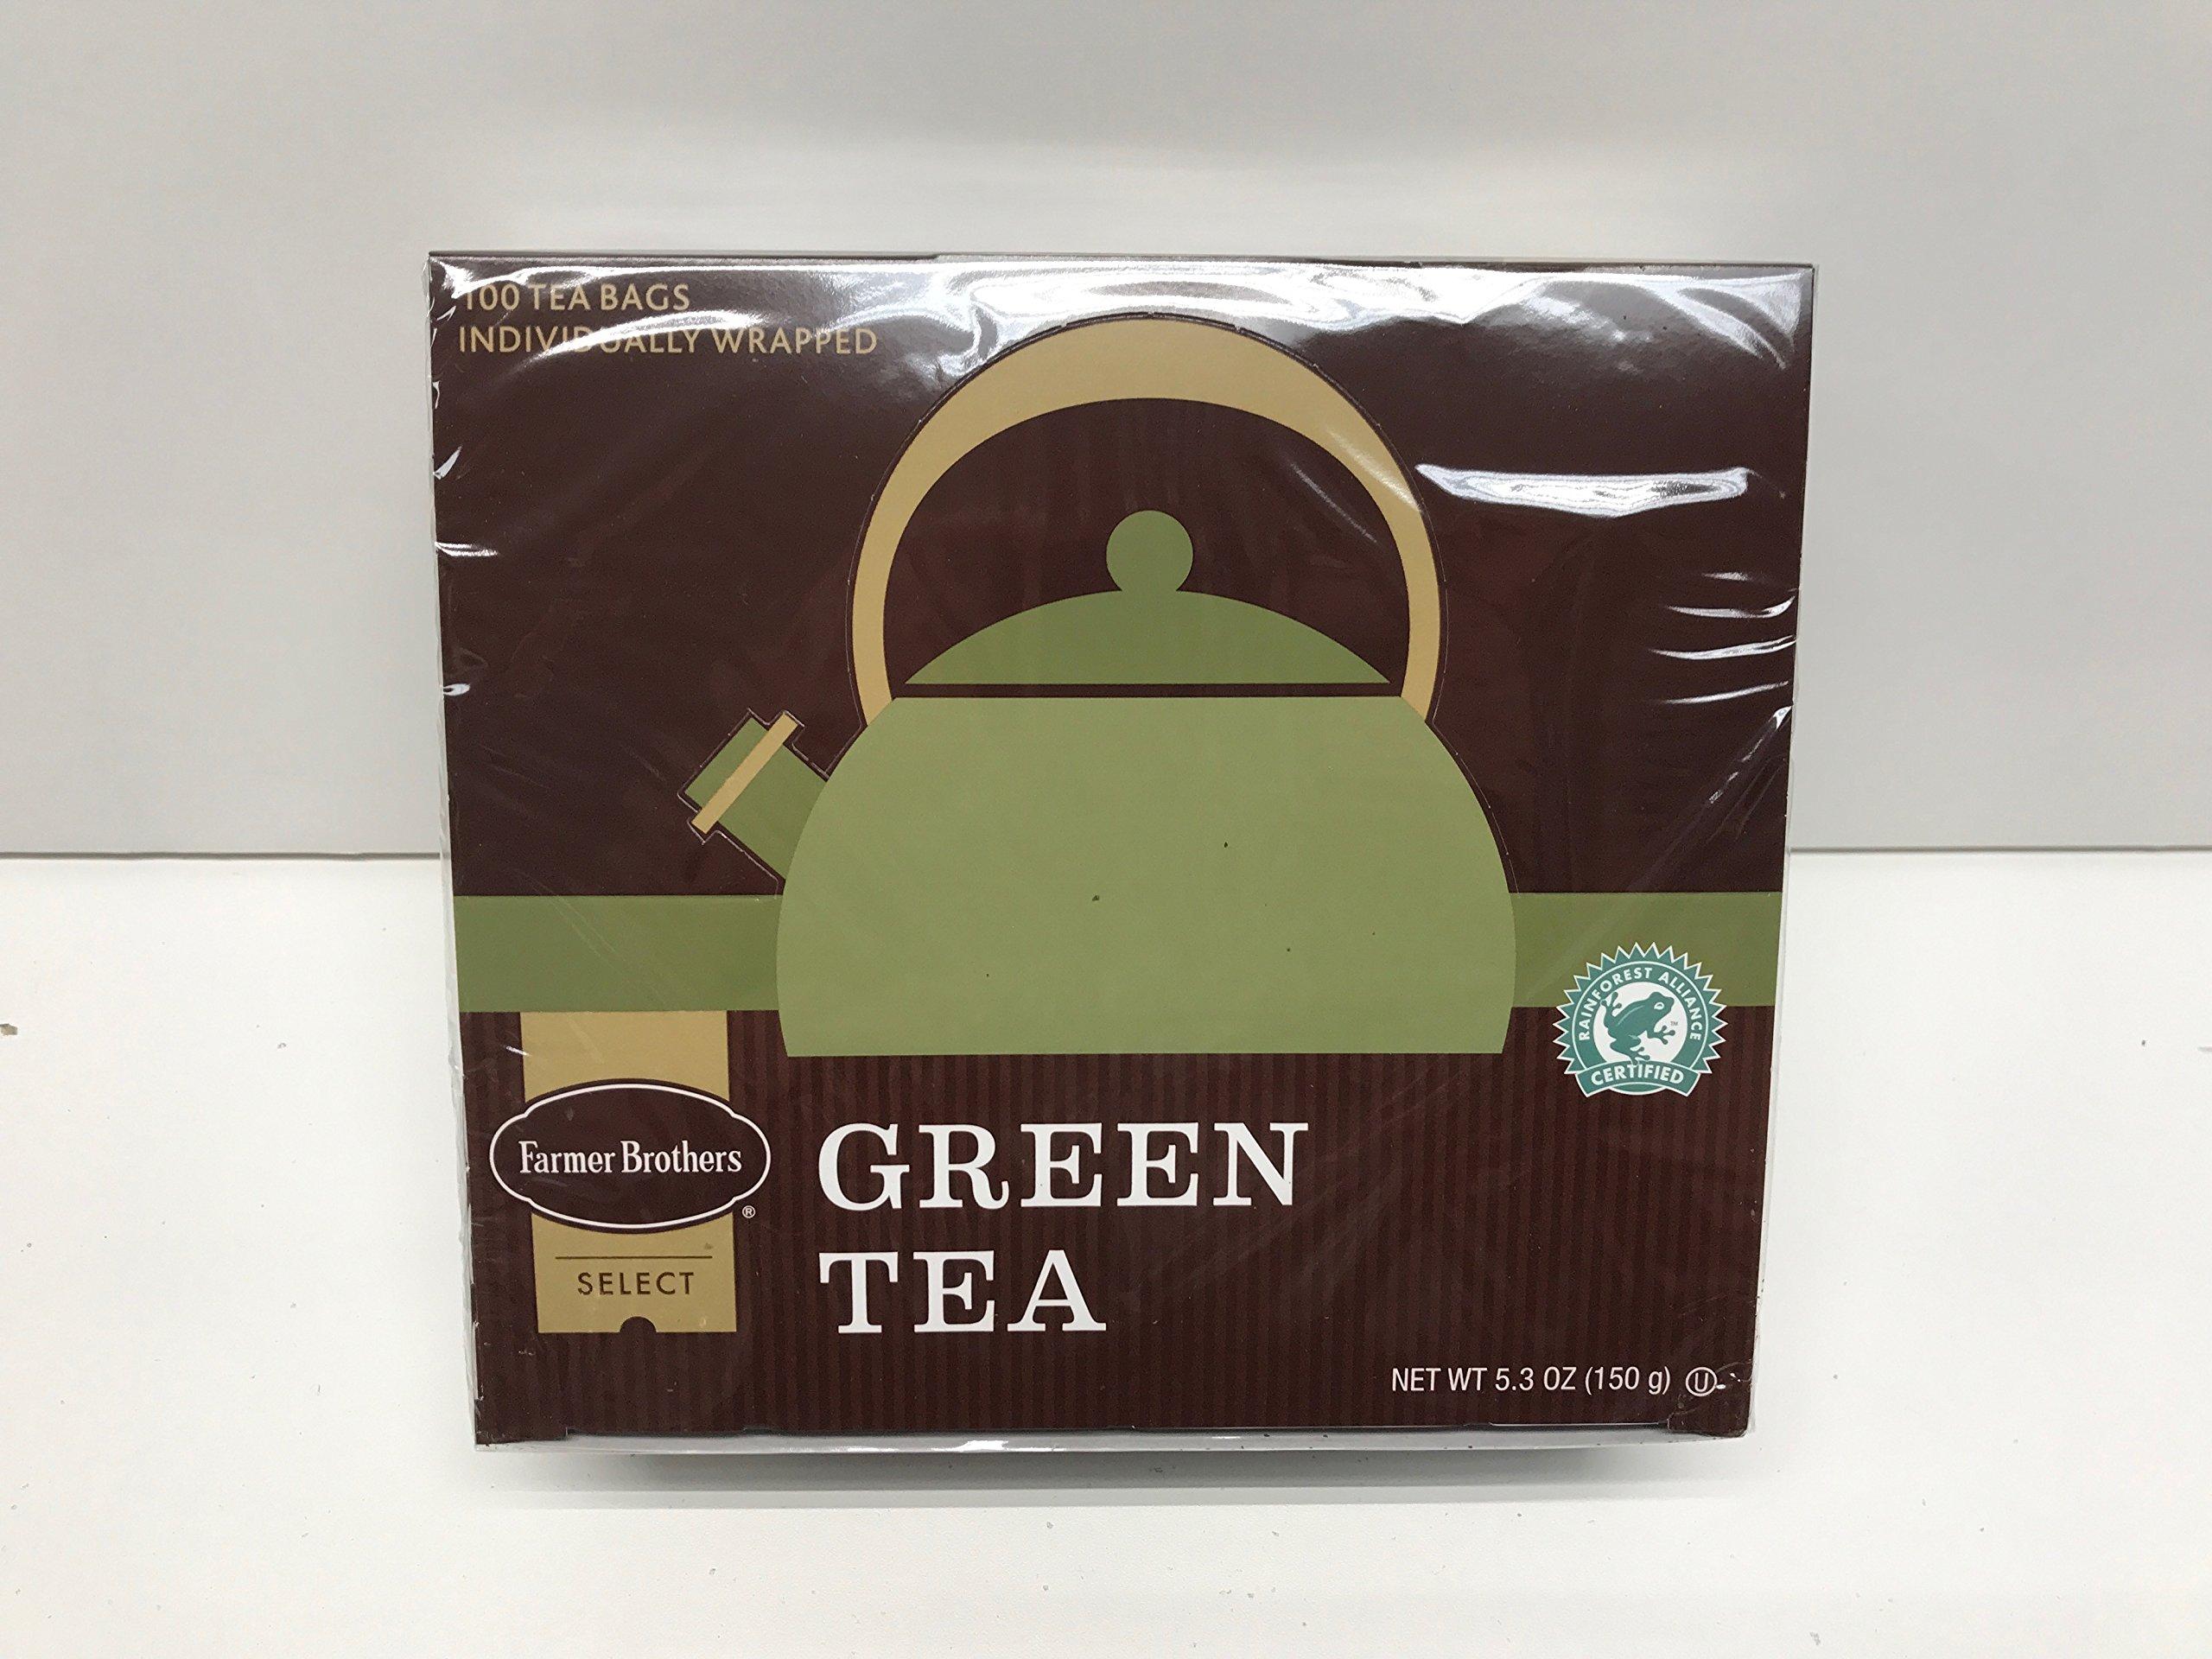 Farmer Brothers Tea Bags - Green Tea, 1 box - 100 count